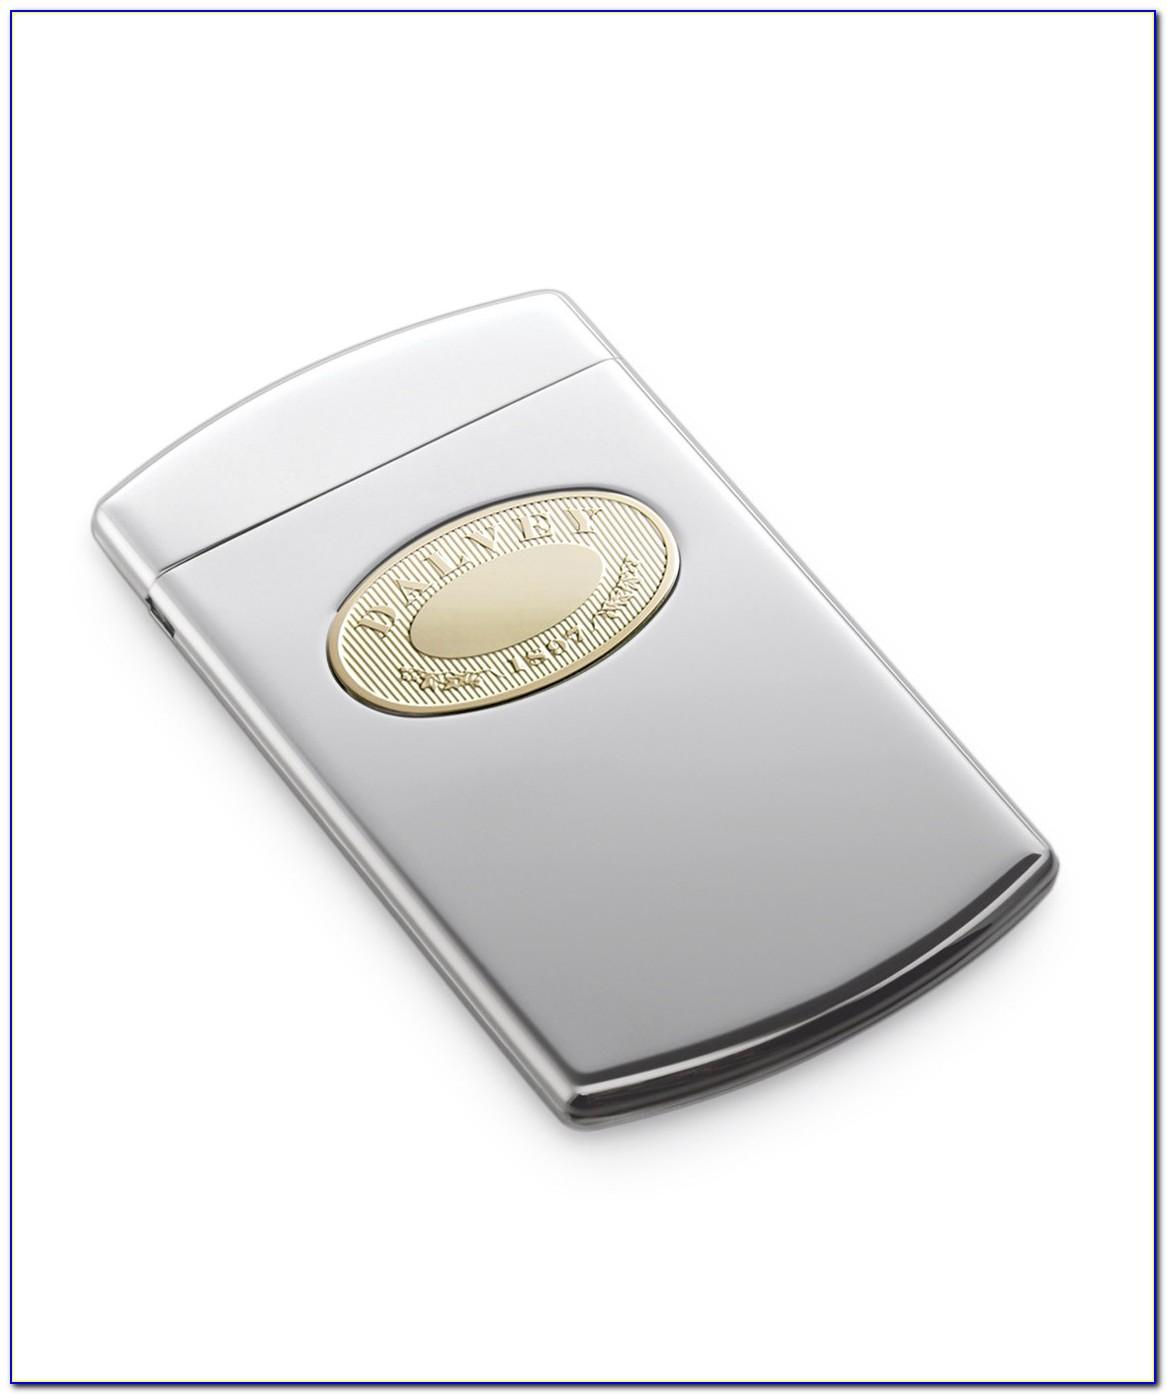 Dalvey Business Card Holder